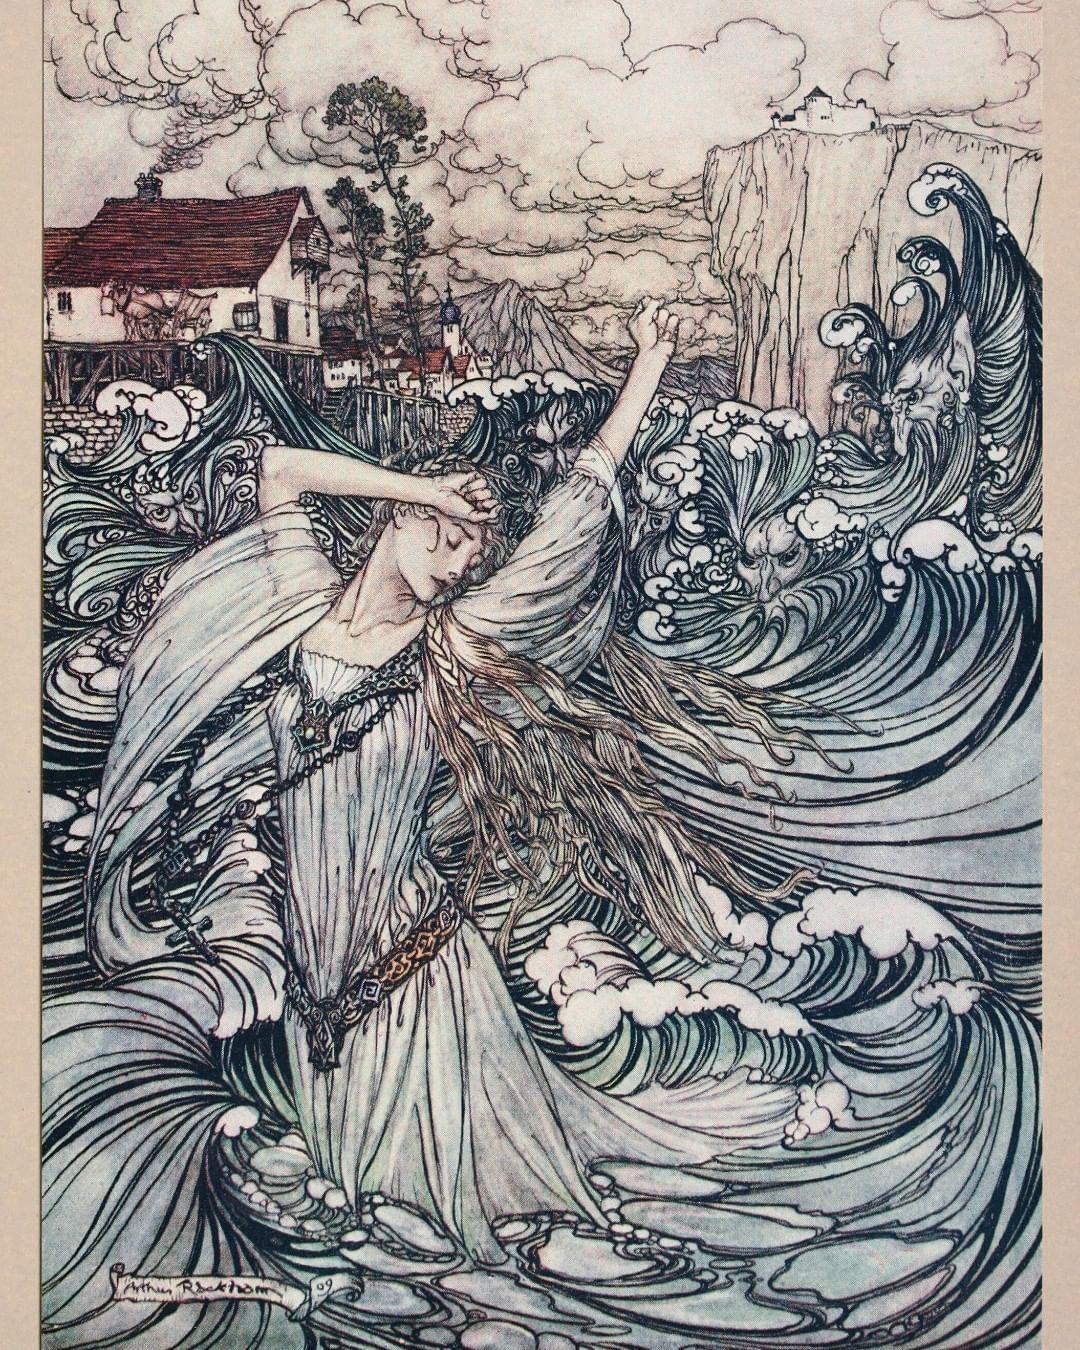 Curator Of The Past On Instagram From Undine By Friedrich De La Motte Fouque Illustrated By Arthur Rackham 1909 Undine Girl In 2020 Fantasy Art Fairytale Art Illustration Art